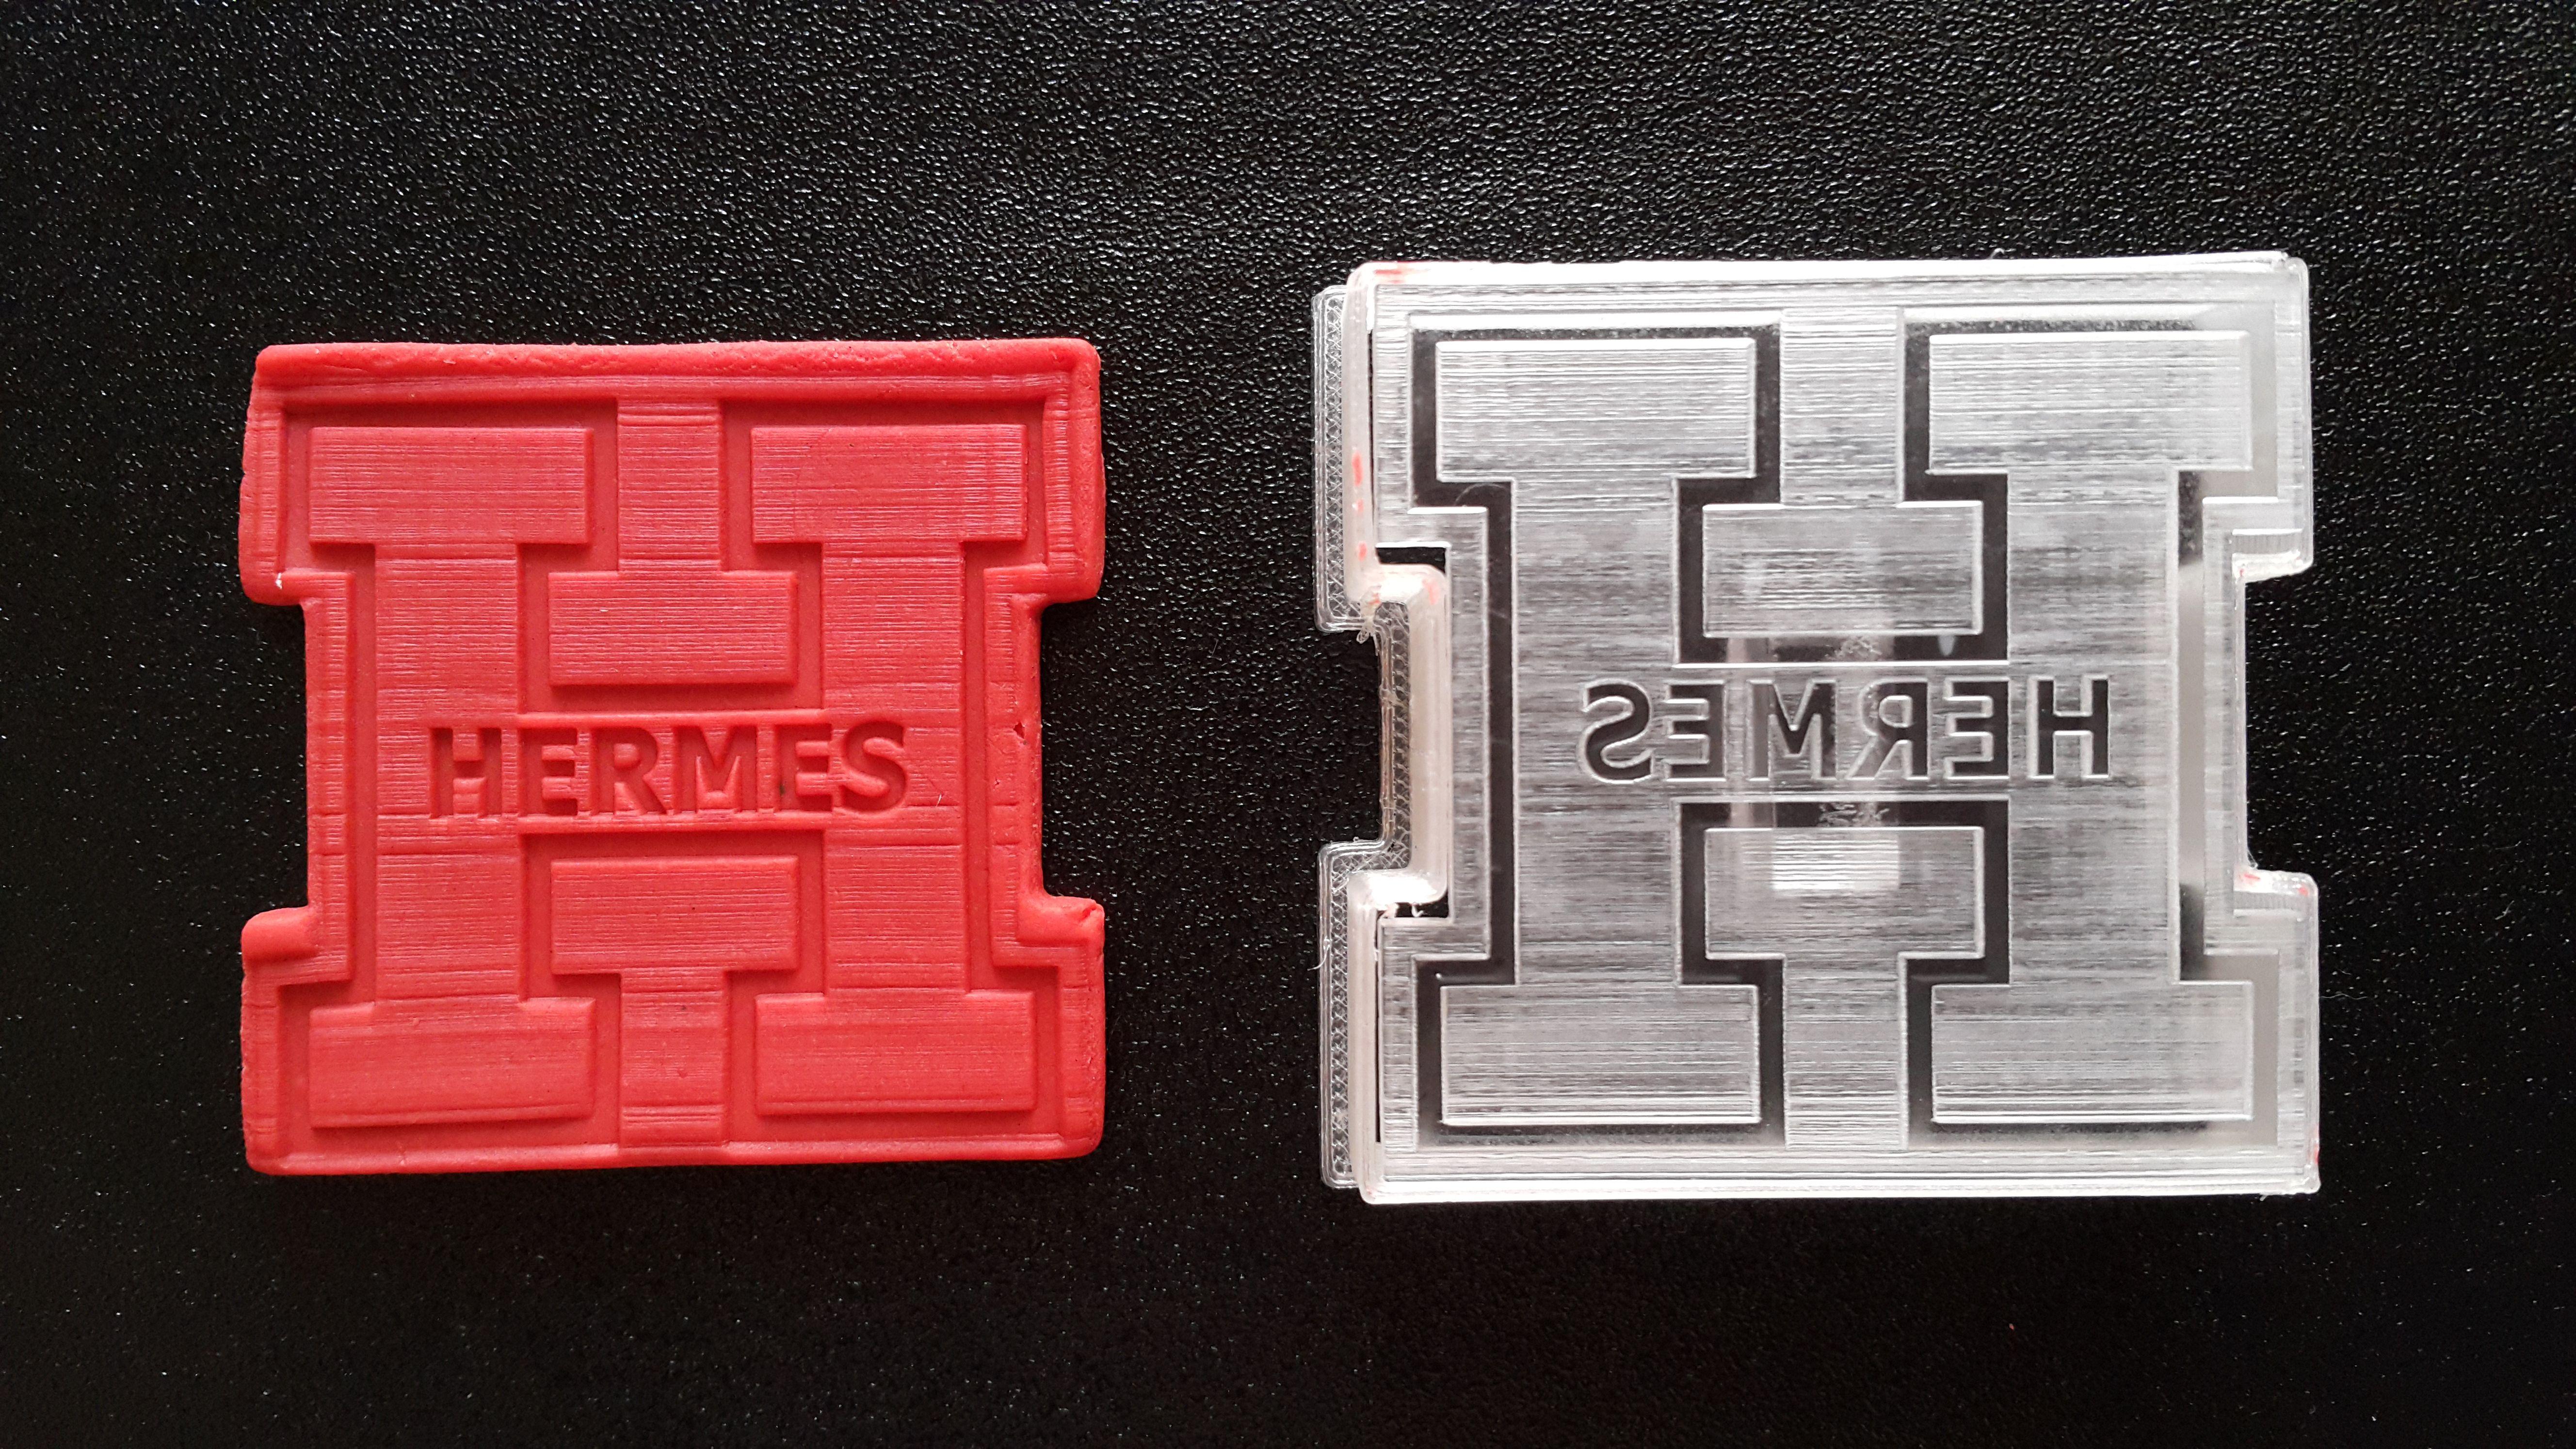 Stamp Cutter Hermes Jsc 061217 Available In 3 Sizes Small Diameter 4 Cm 1 6 Inches Medium Diameter 6 Cm 2 4 Inches Large Diameter 8 Cm 3 2 Inc